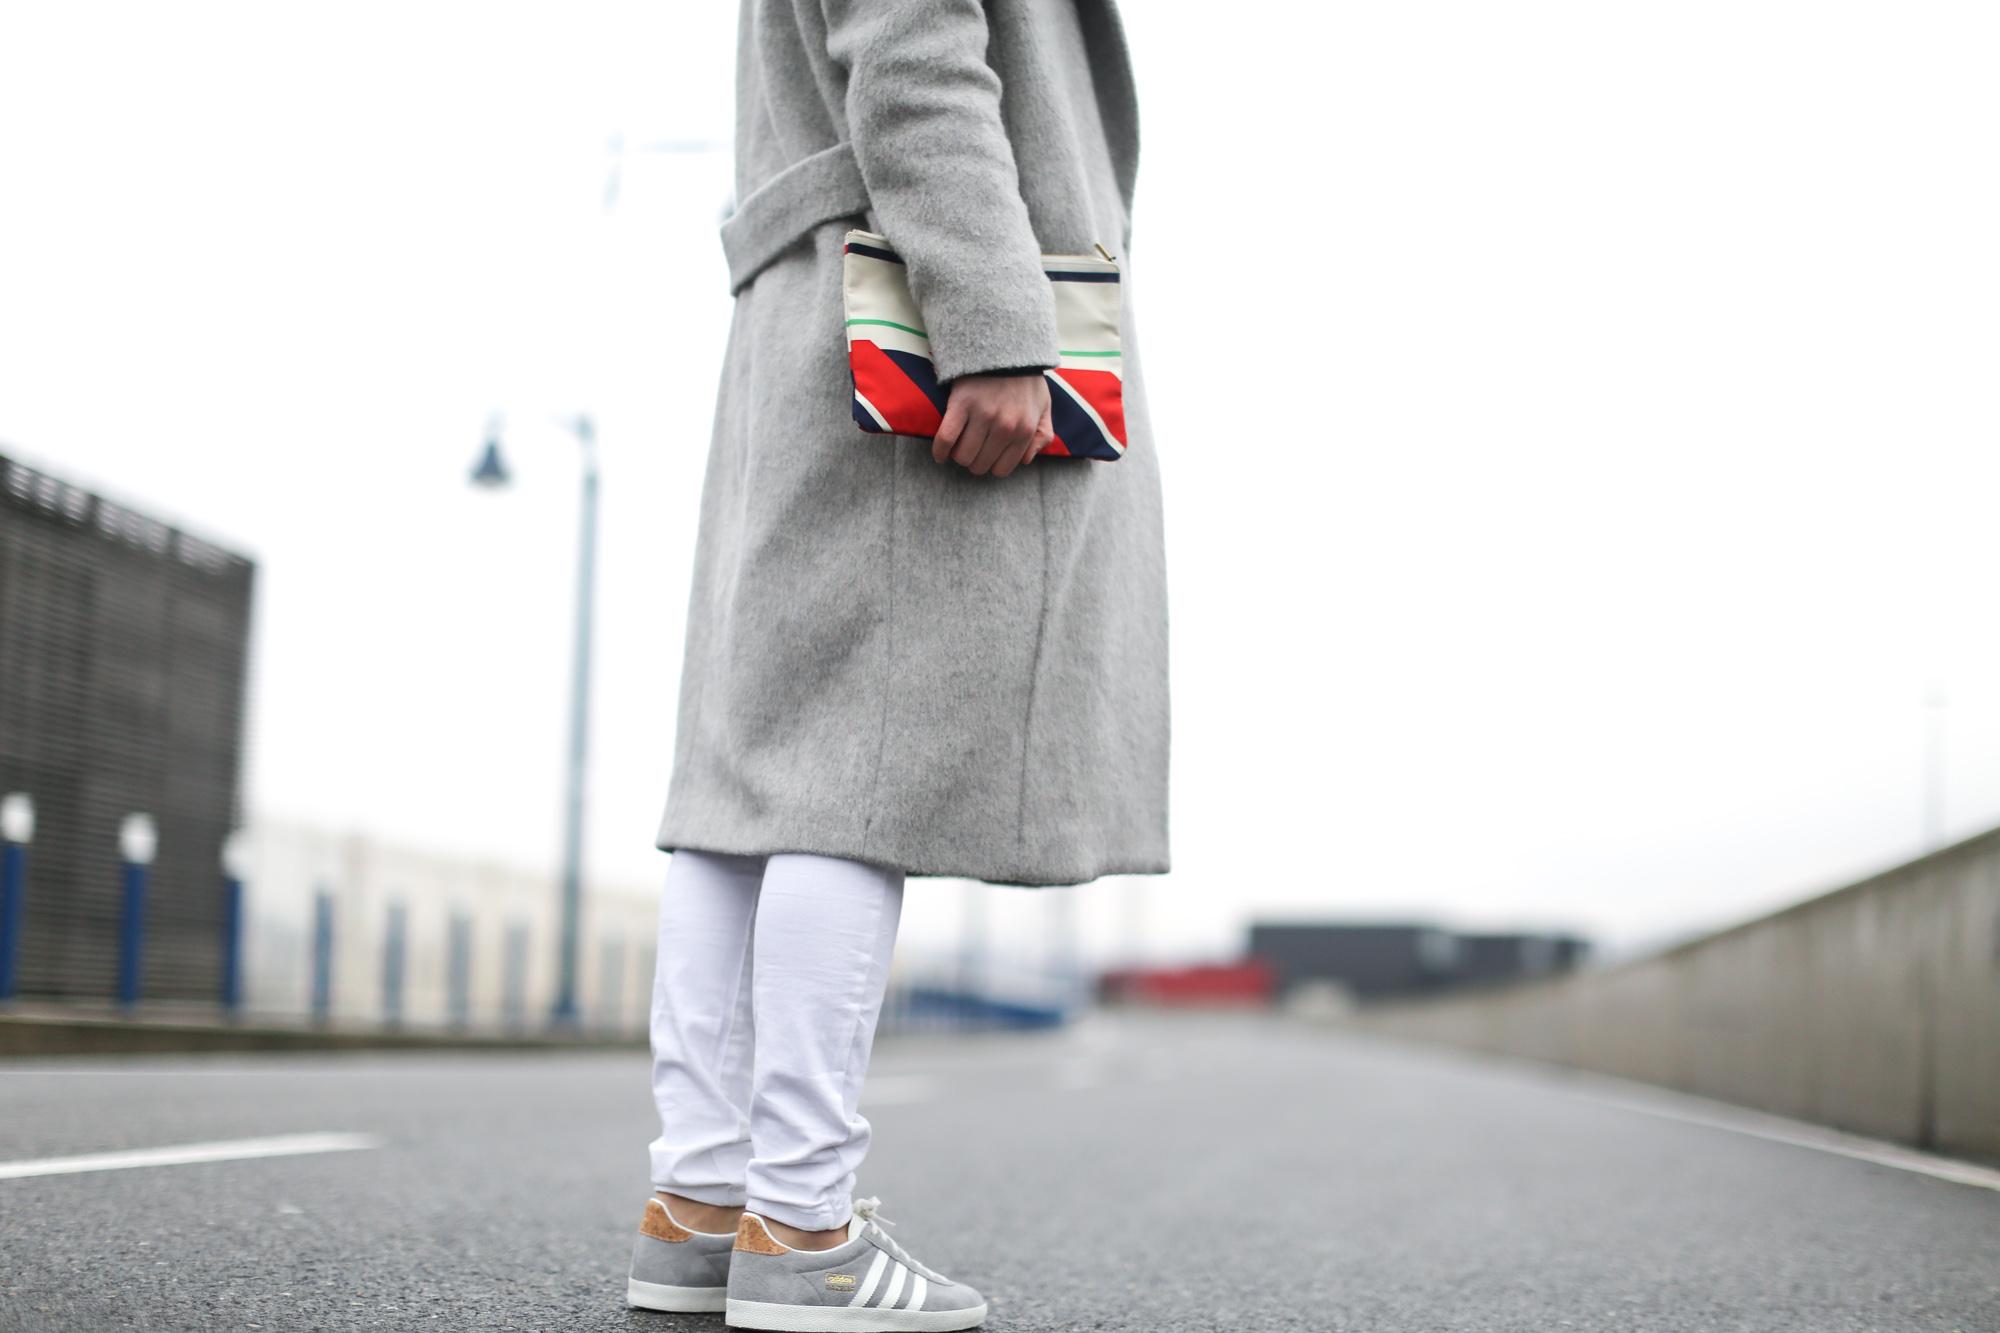 Clochet-streetstyle-leztinstreet-adidas-gazelle-vintage-retro-4